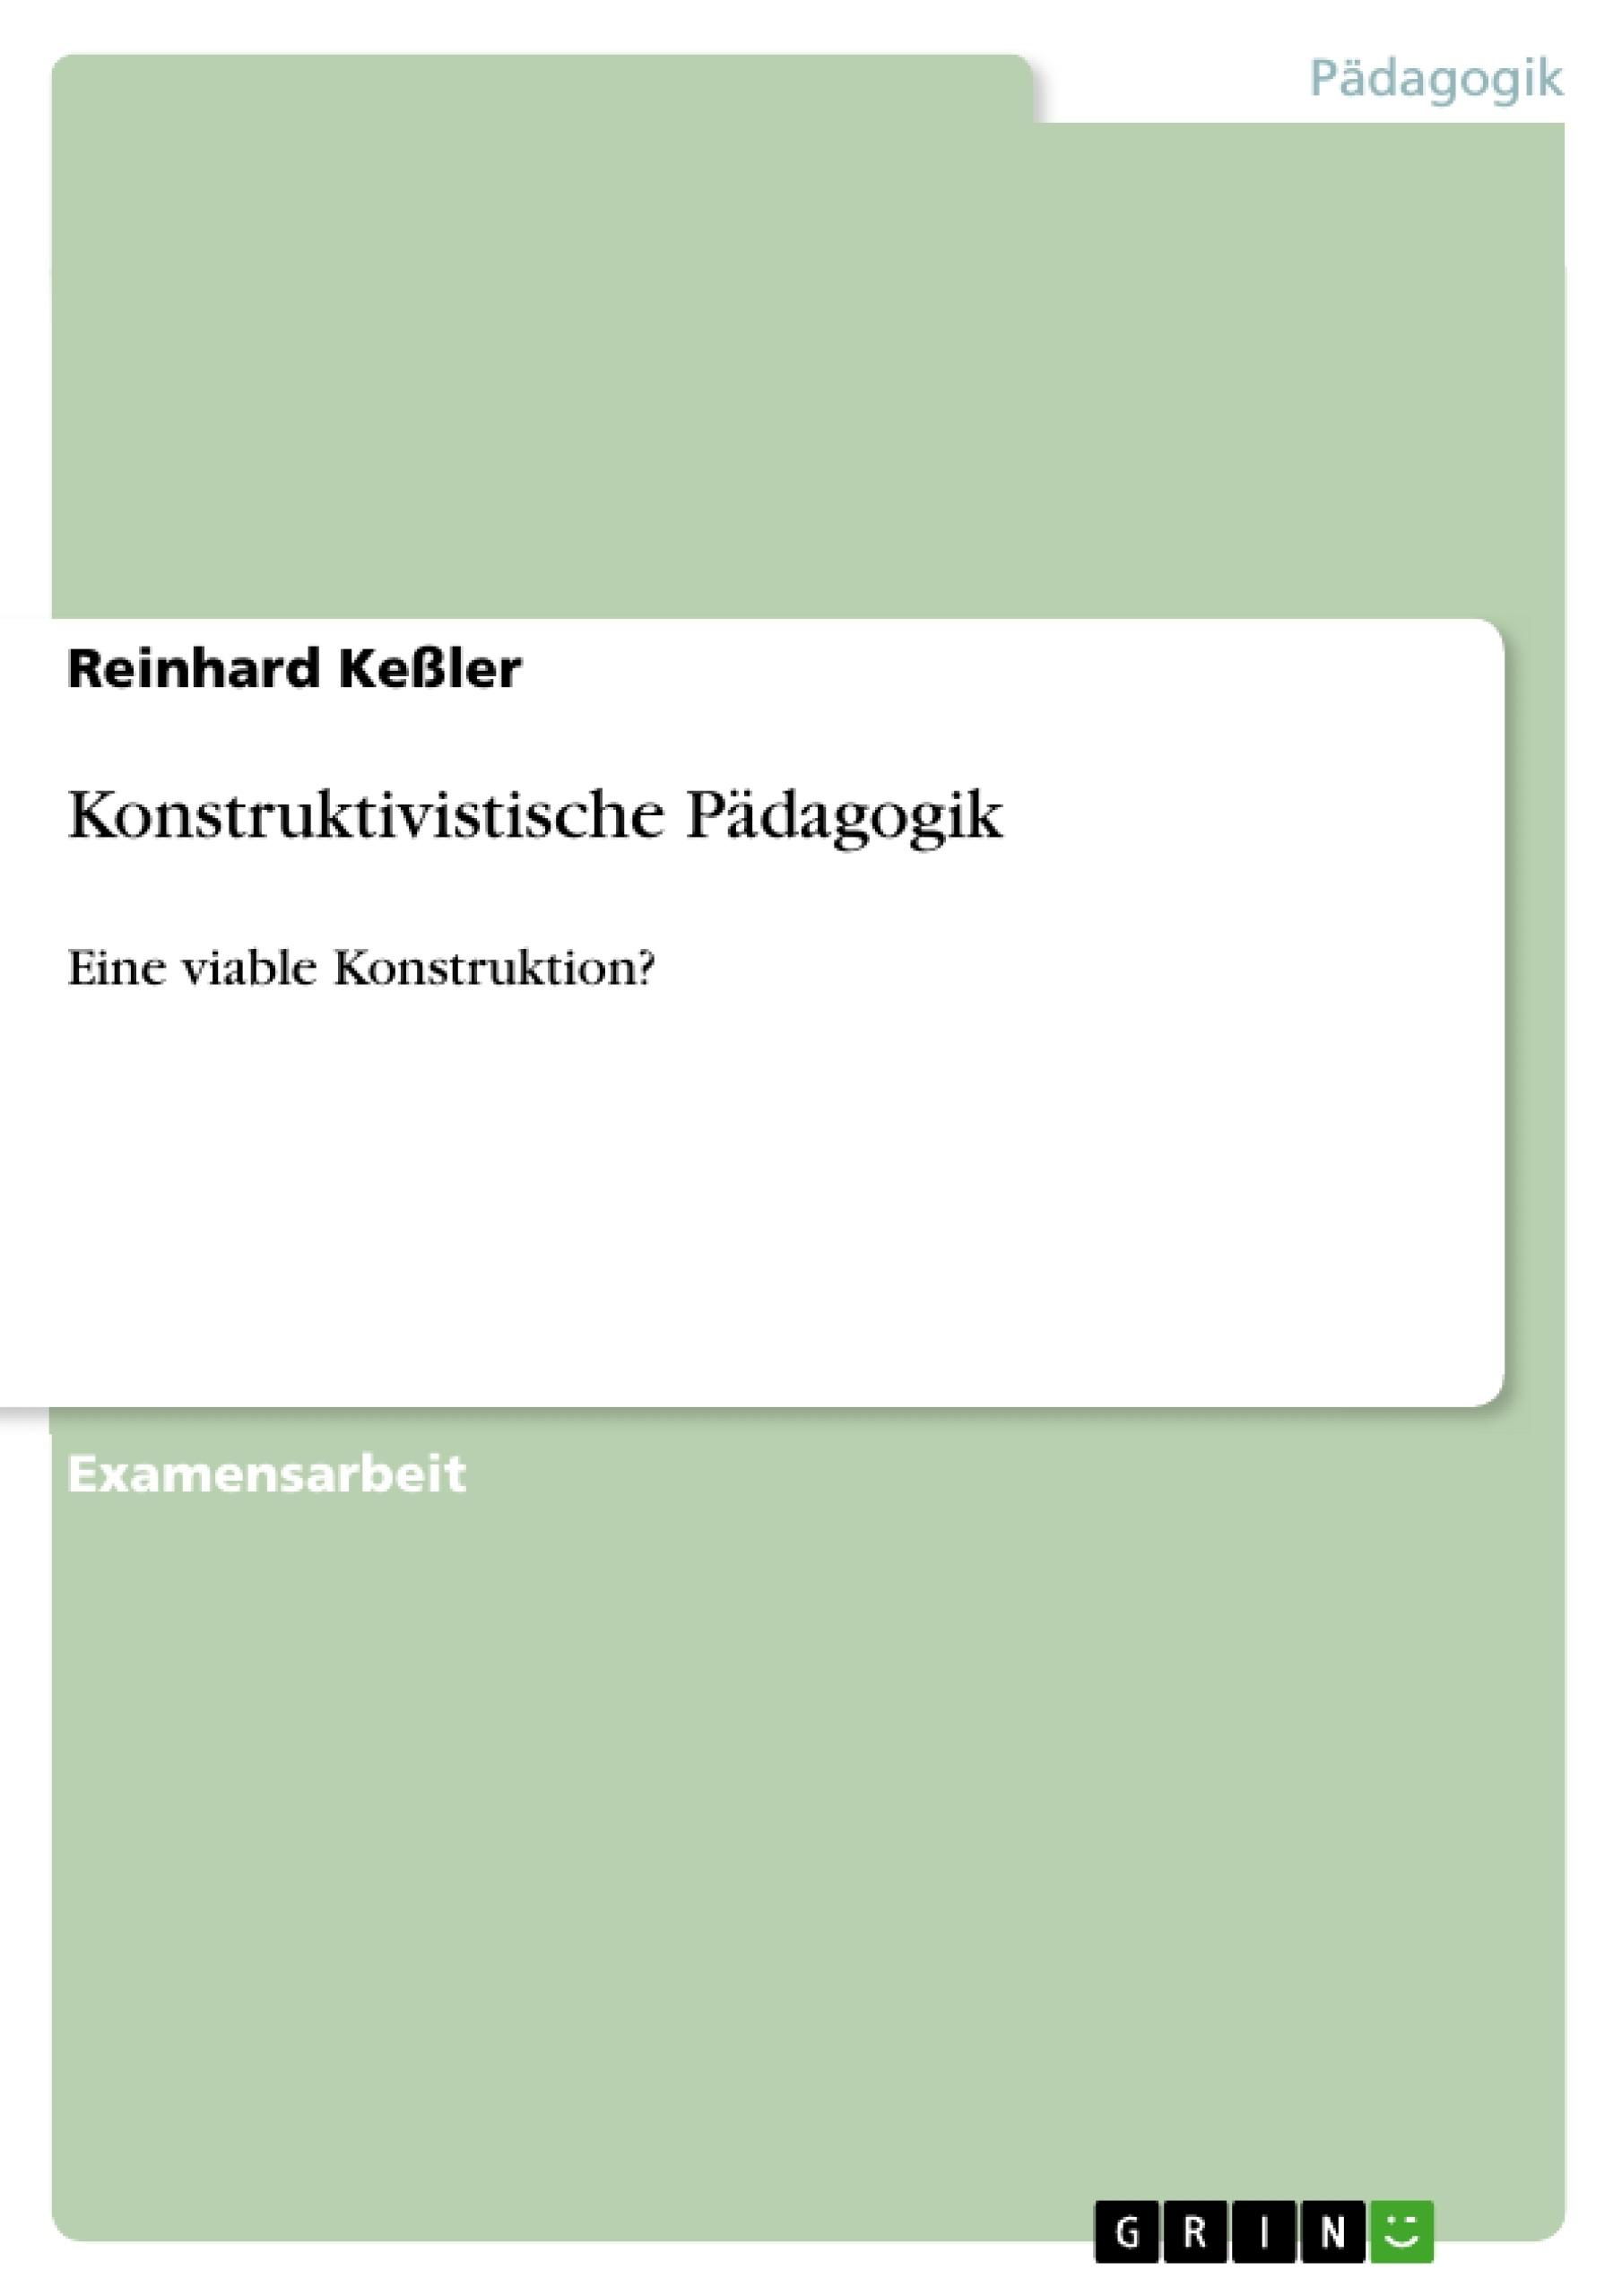 Titel: Konstruktivistische Pädagogik